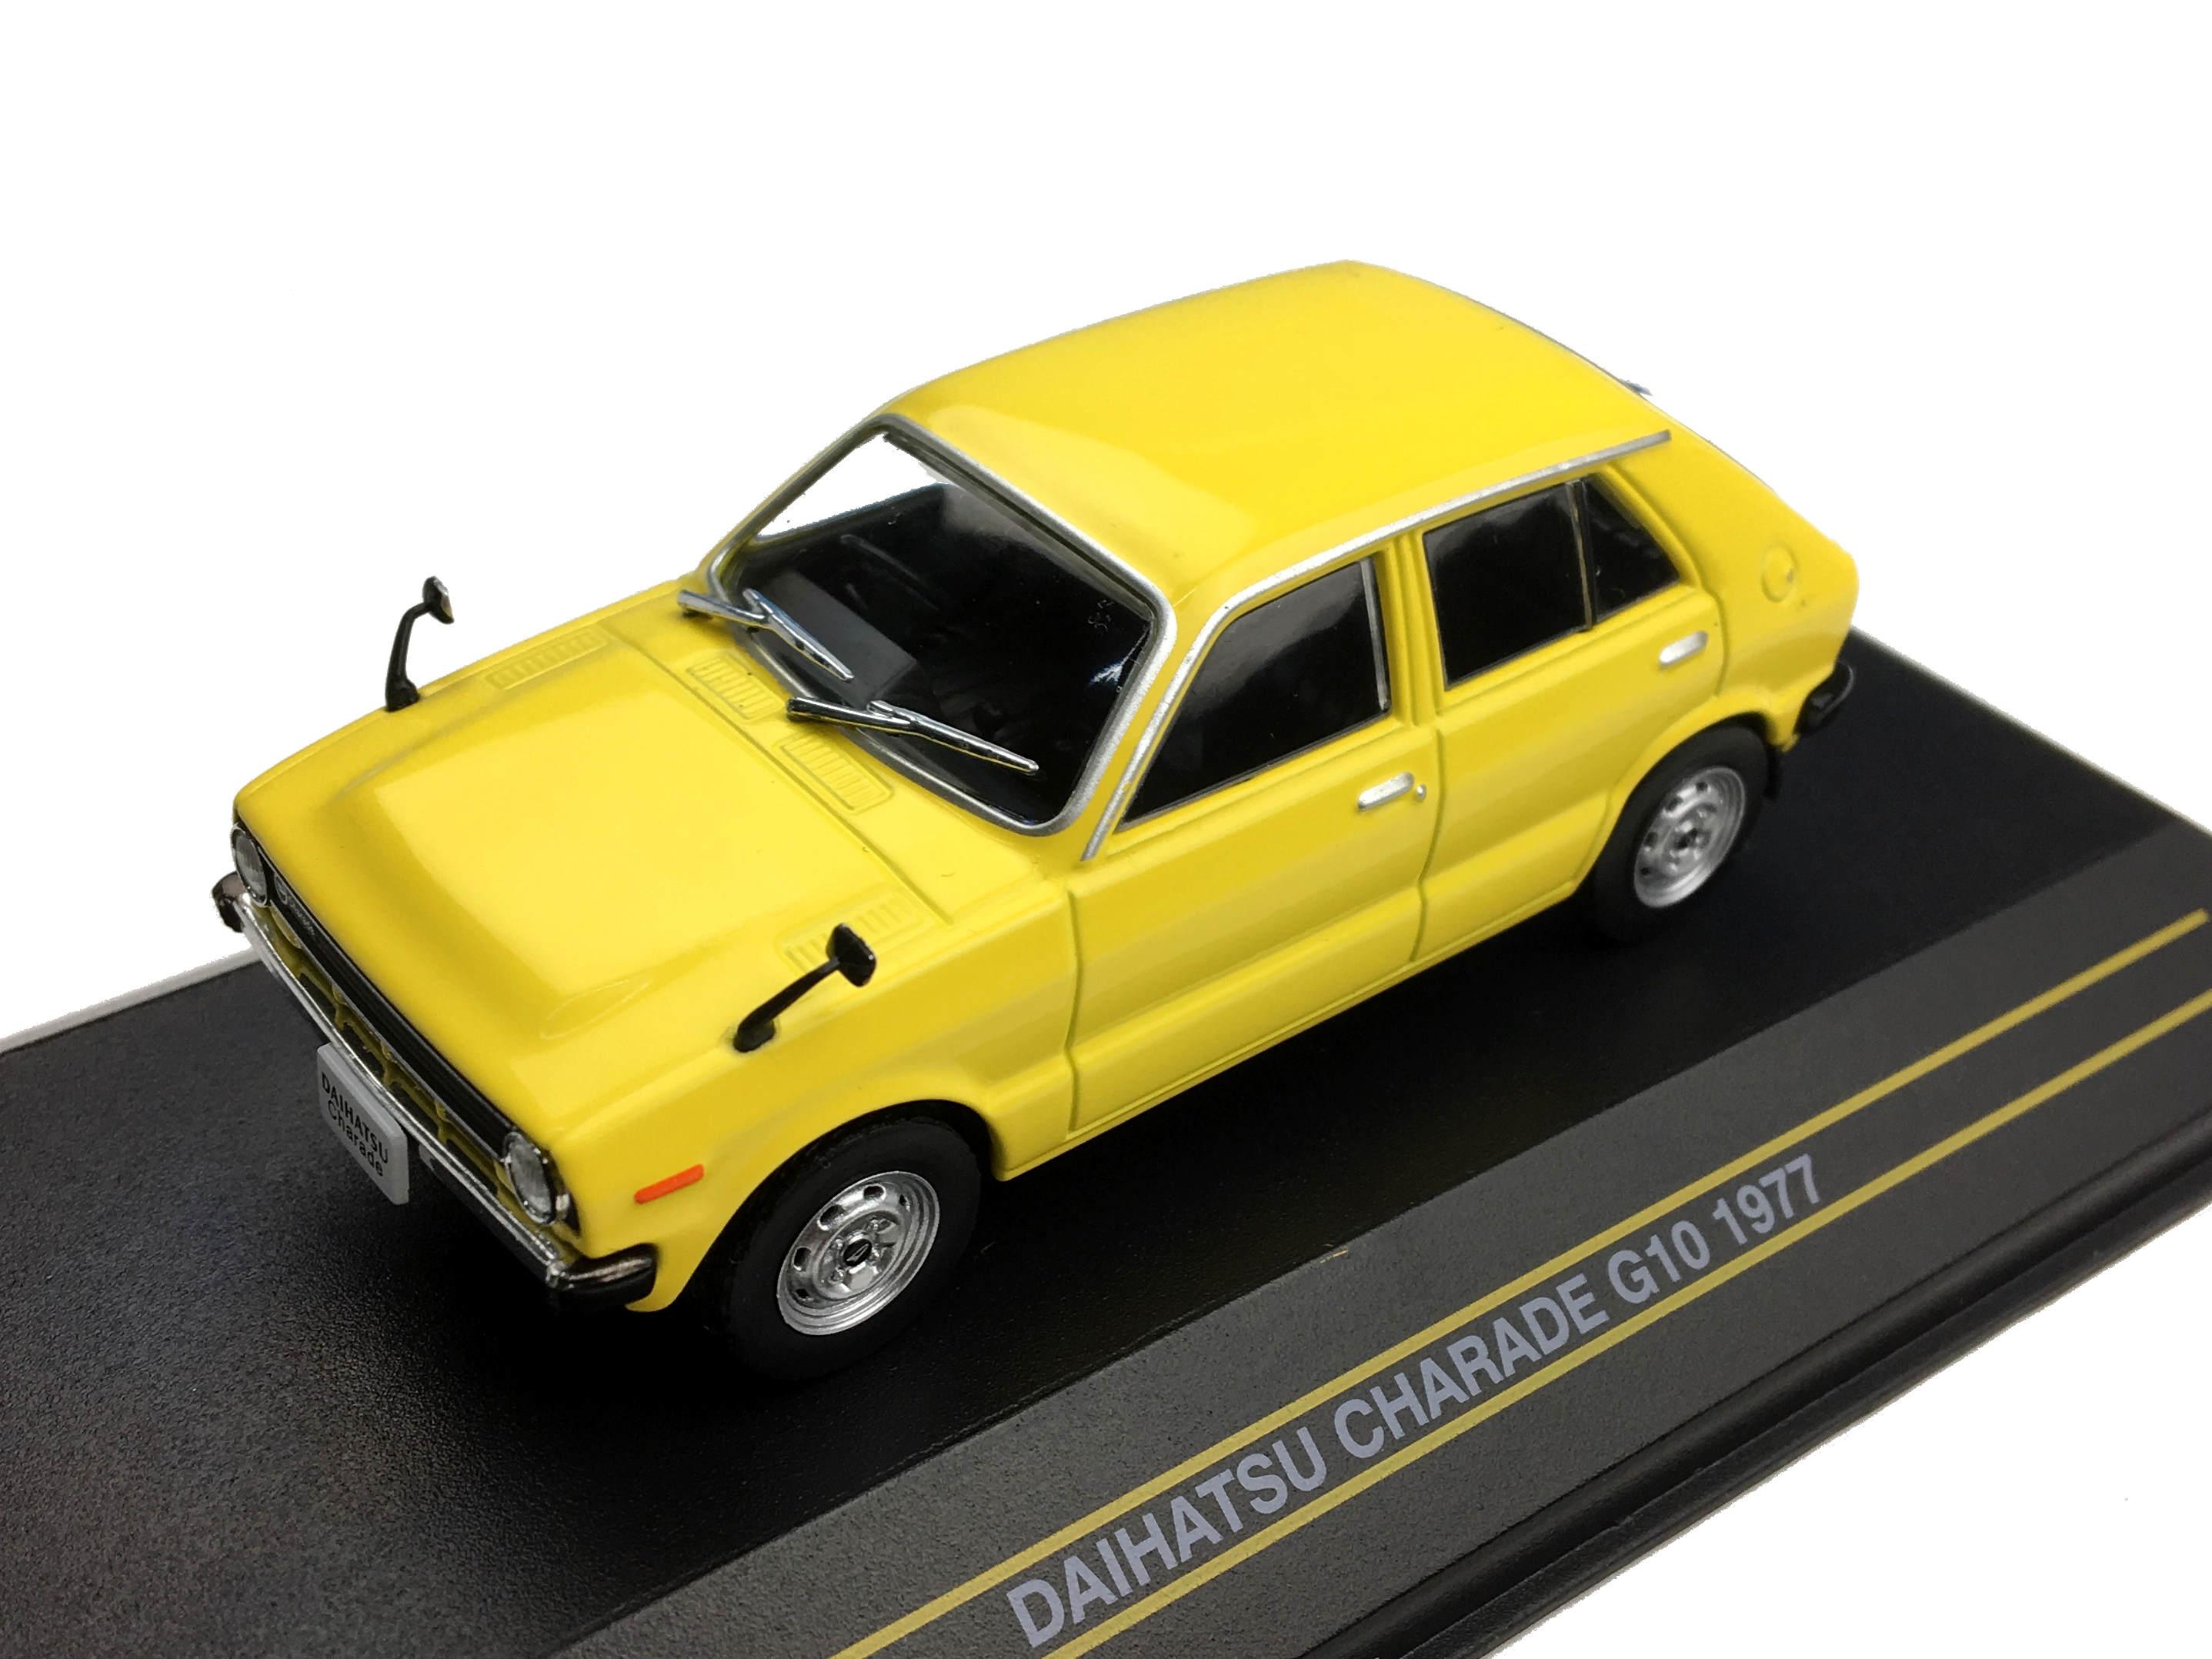 First43/ファースト43 ダイハツ シャレード G10 1977 イエロー